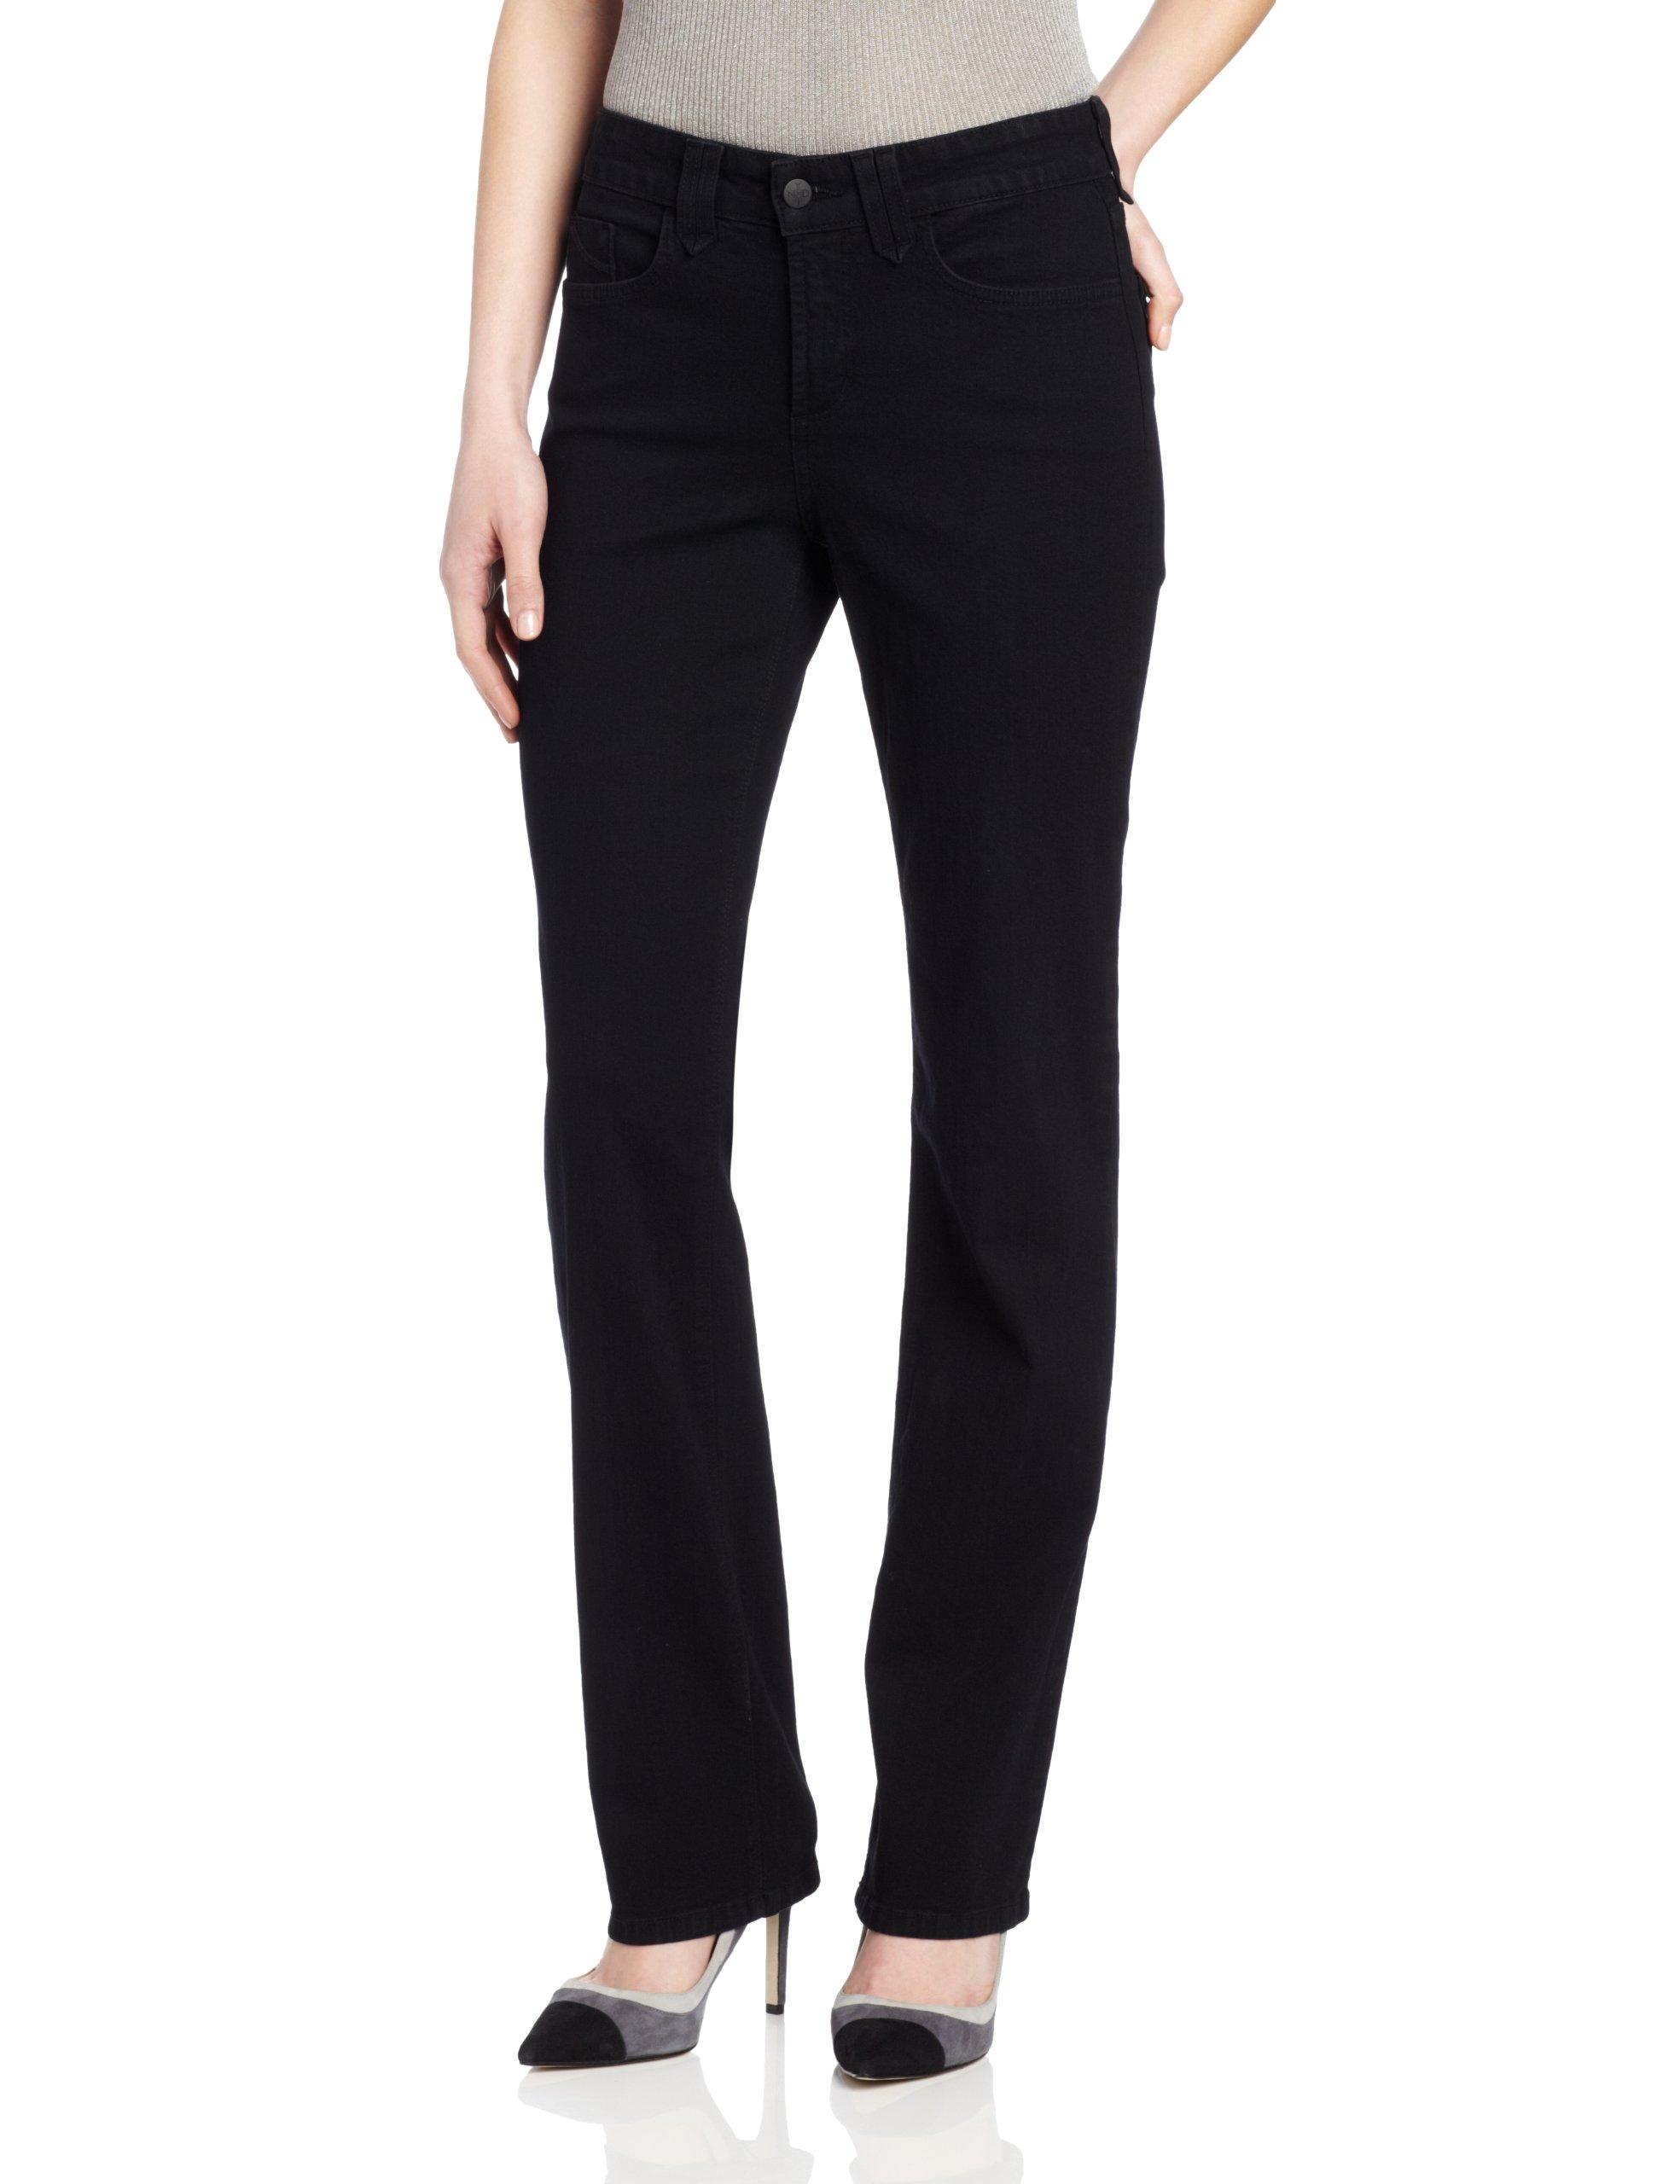 NYDJ Women's Petite Hayden Straight Leg Jeans, Black, 0P